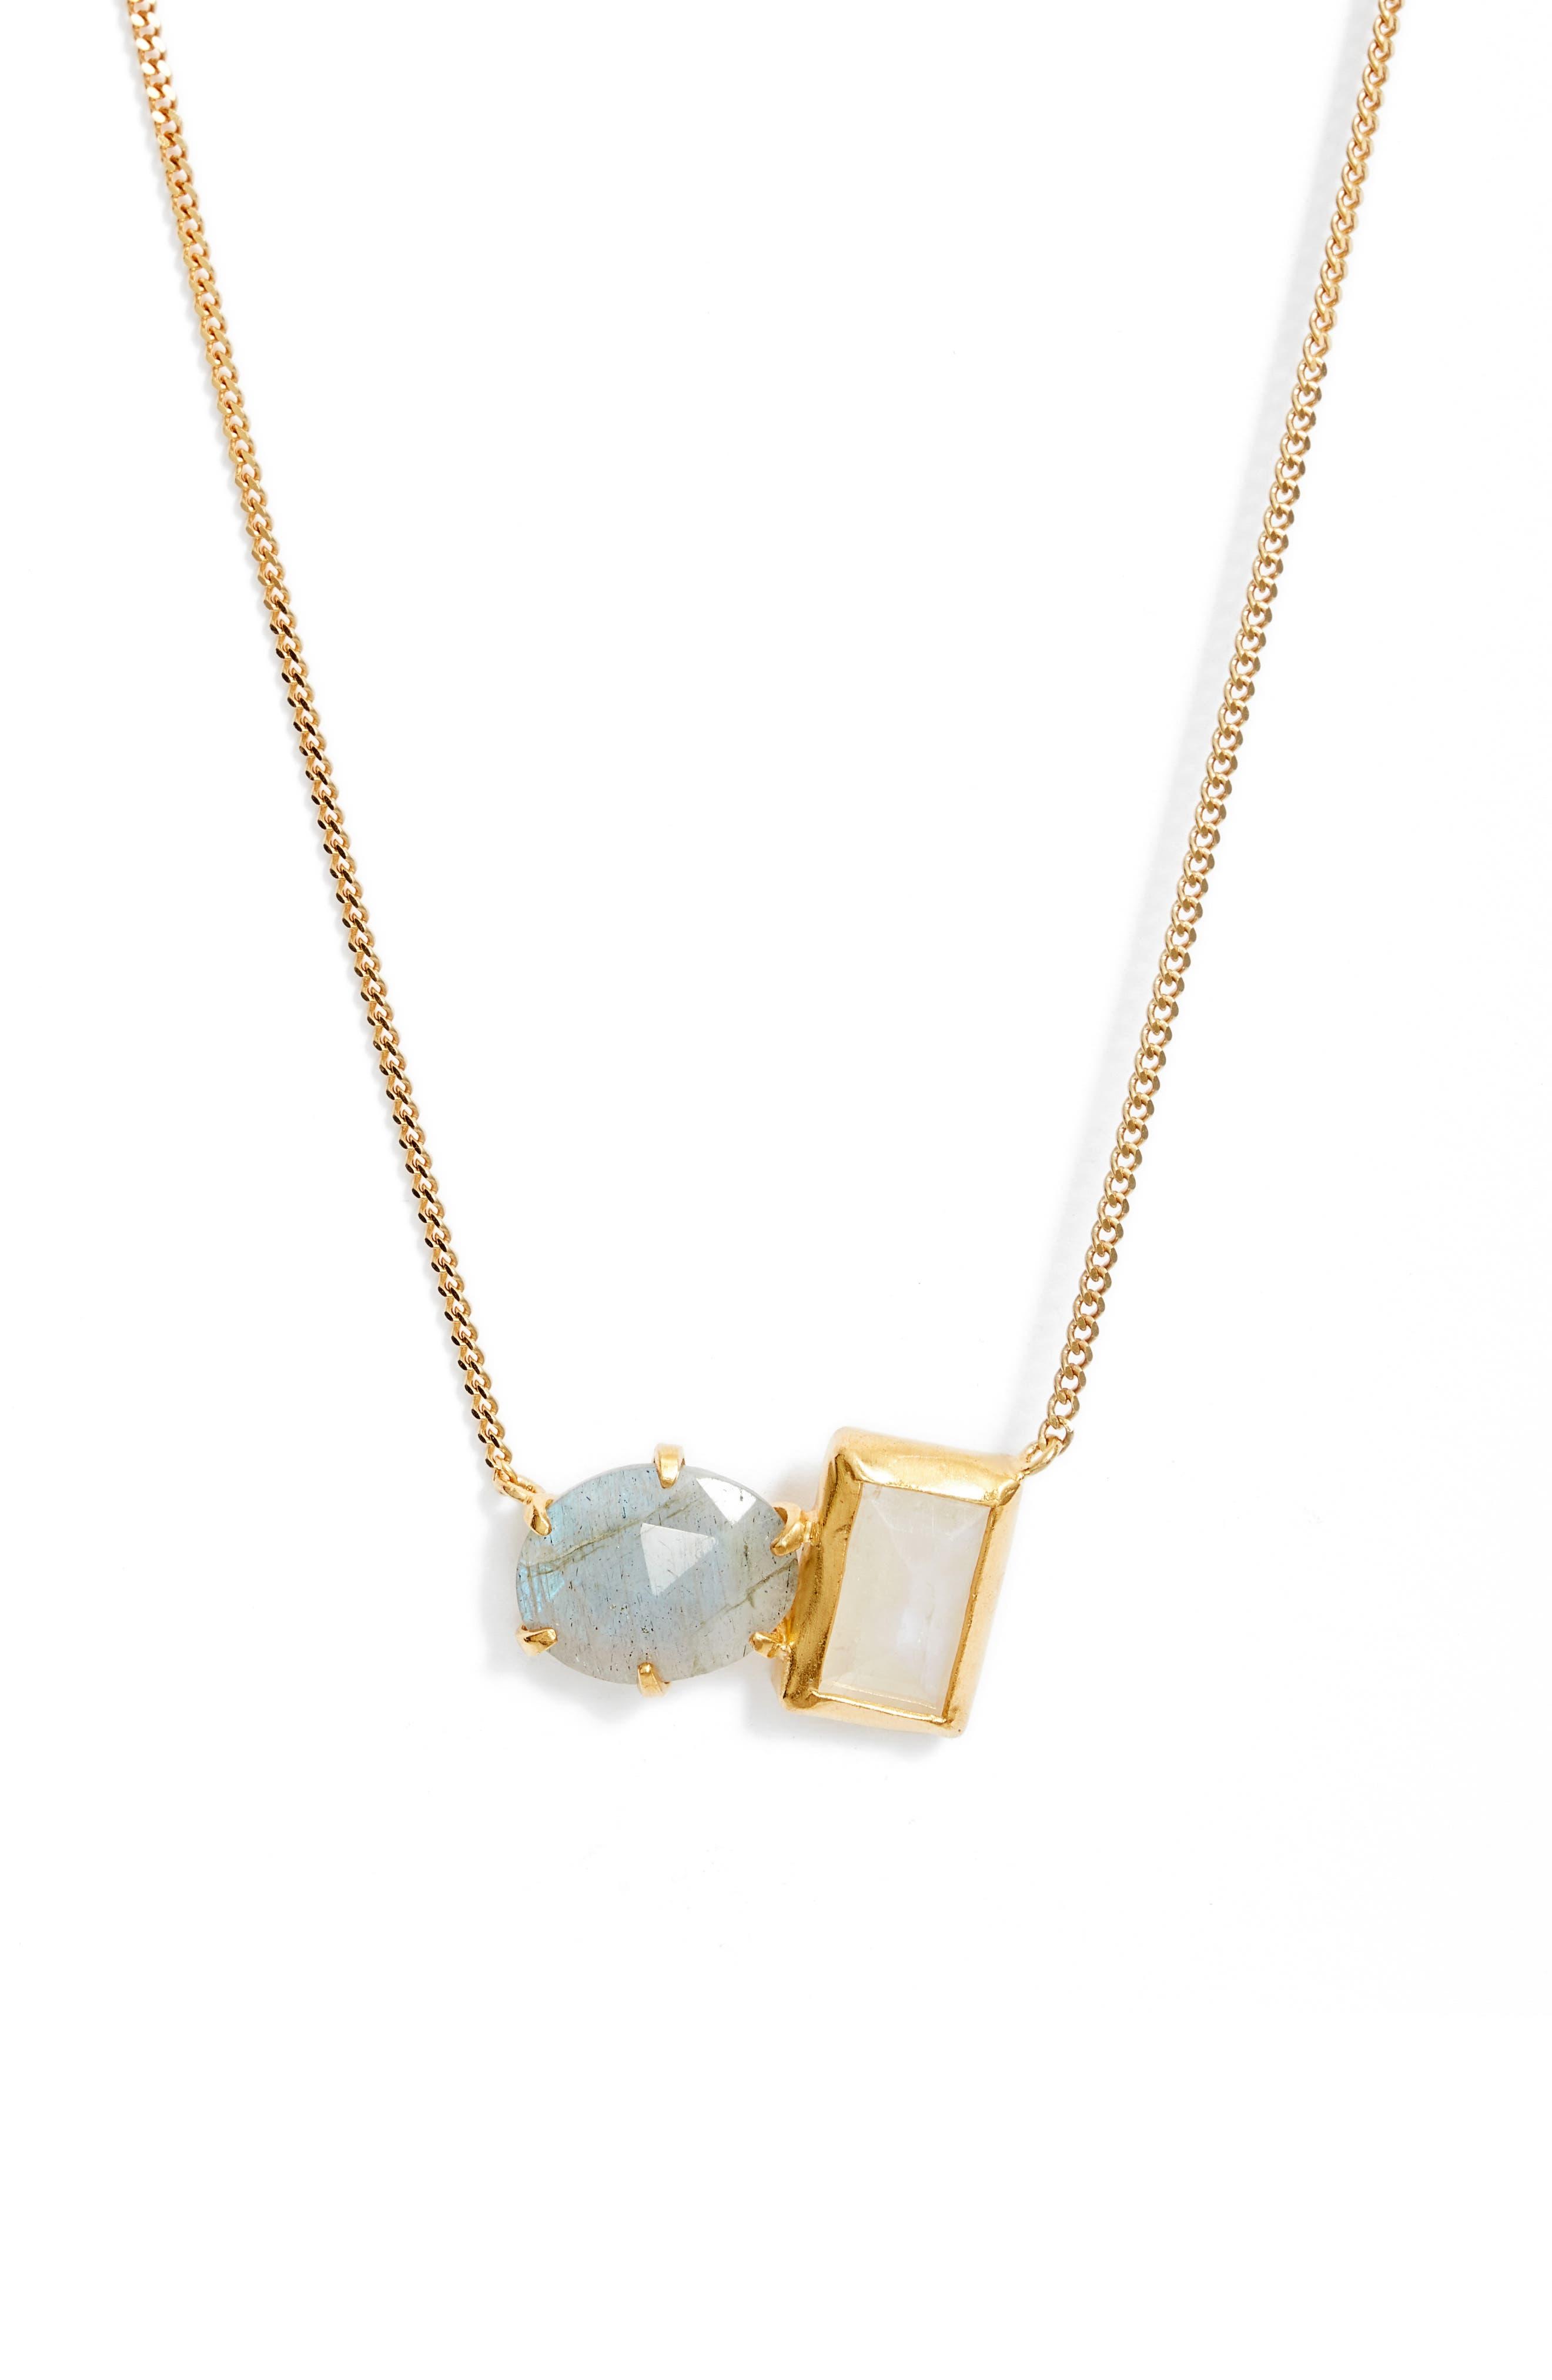 Moonstone & Labradorite Healing Stone Duo Pendant Necklace